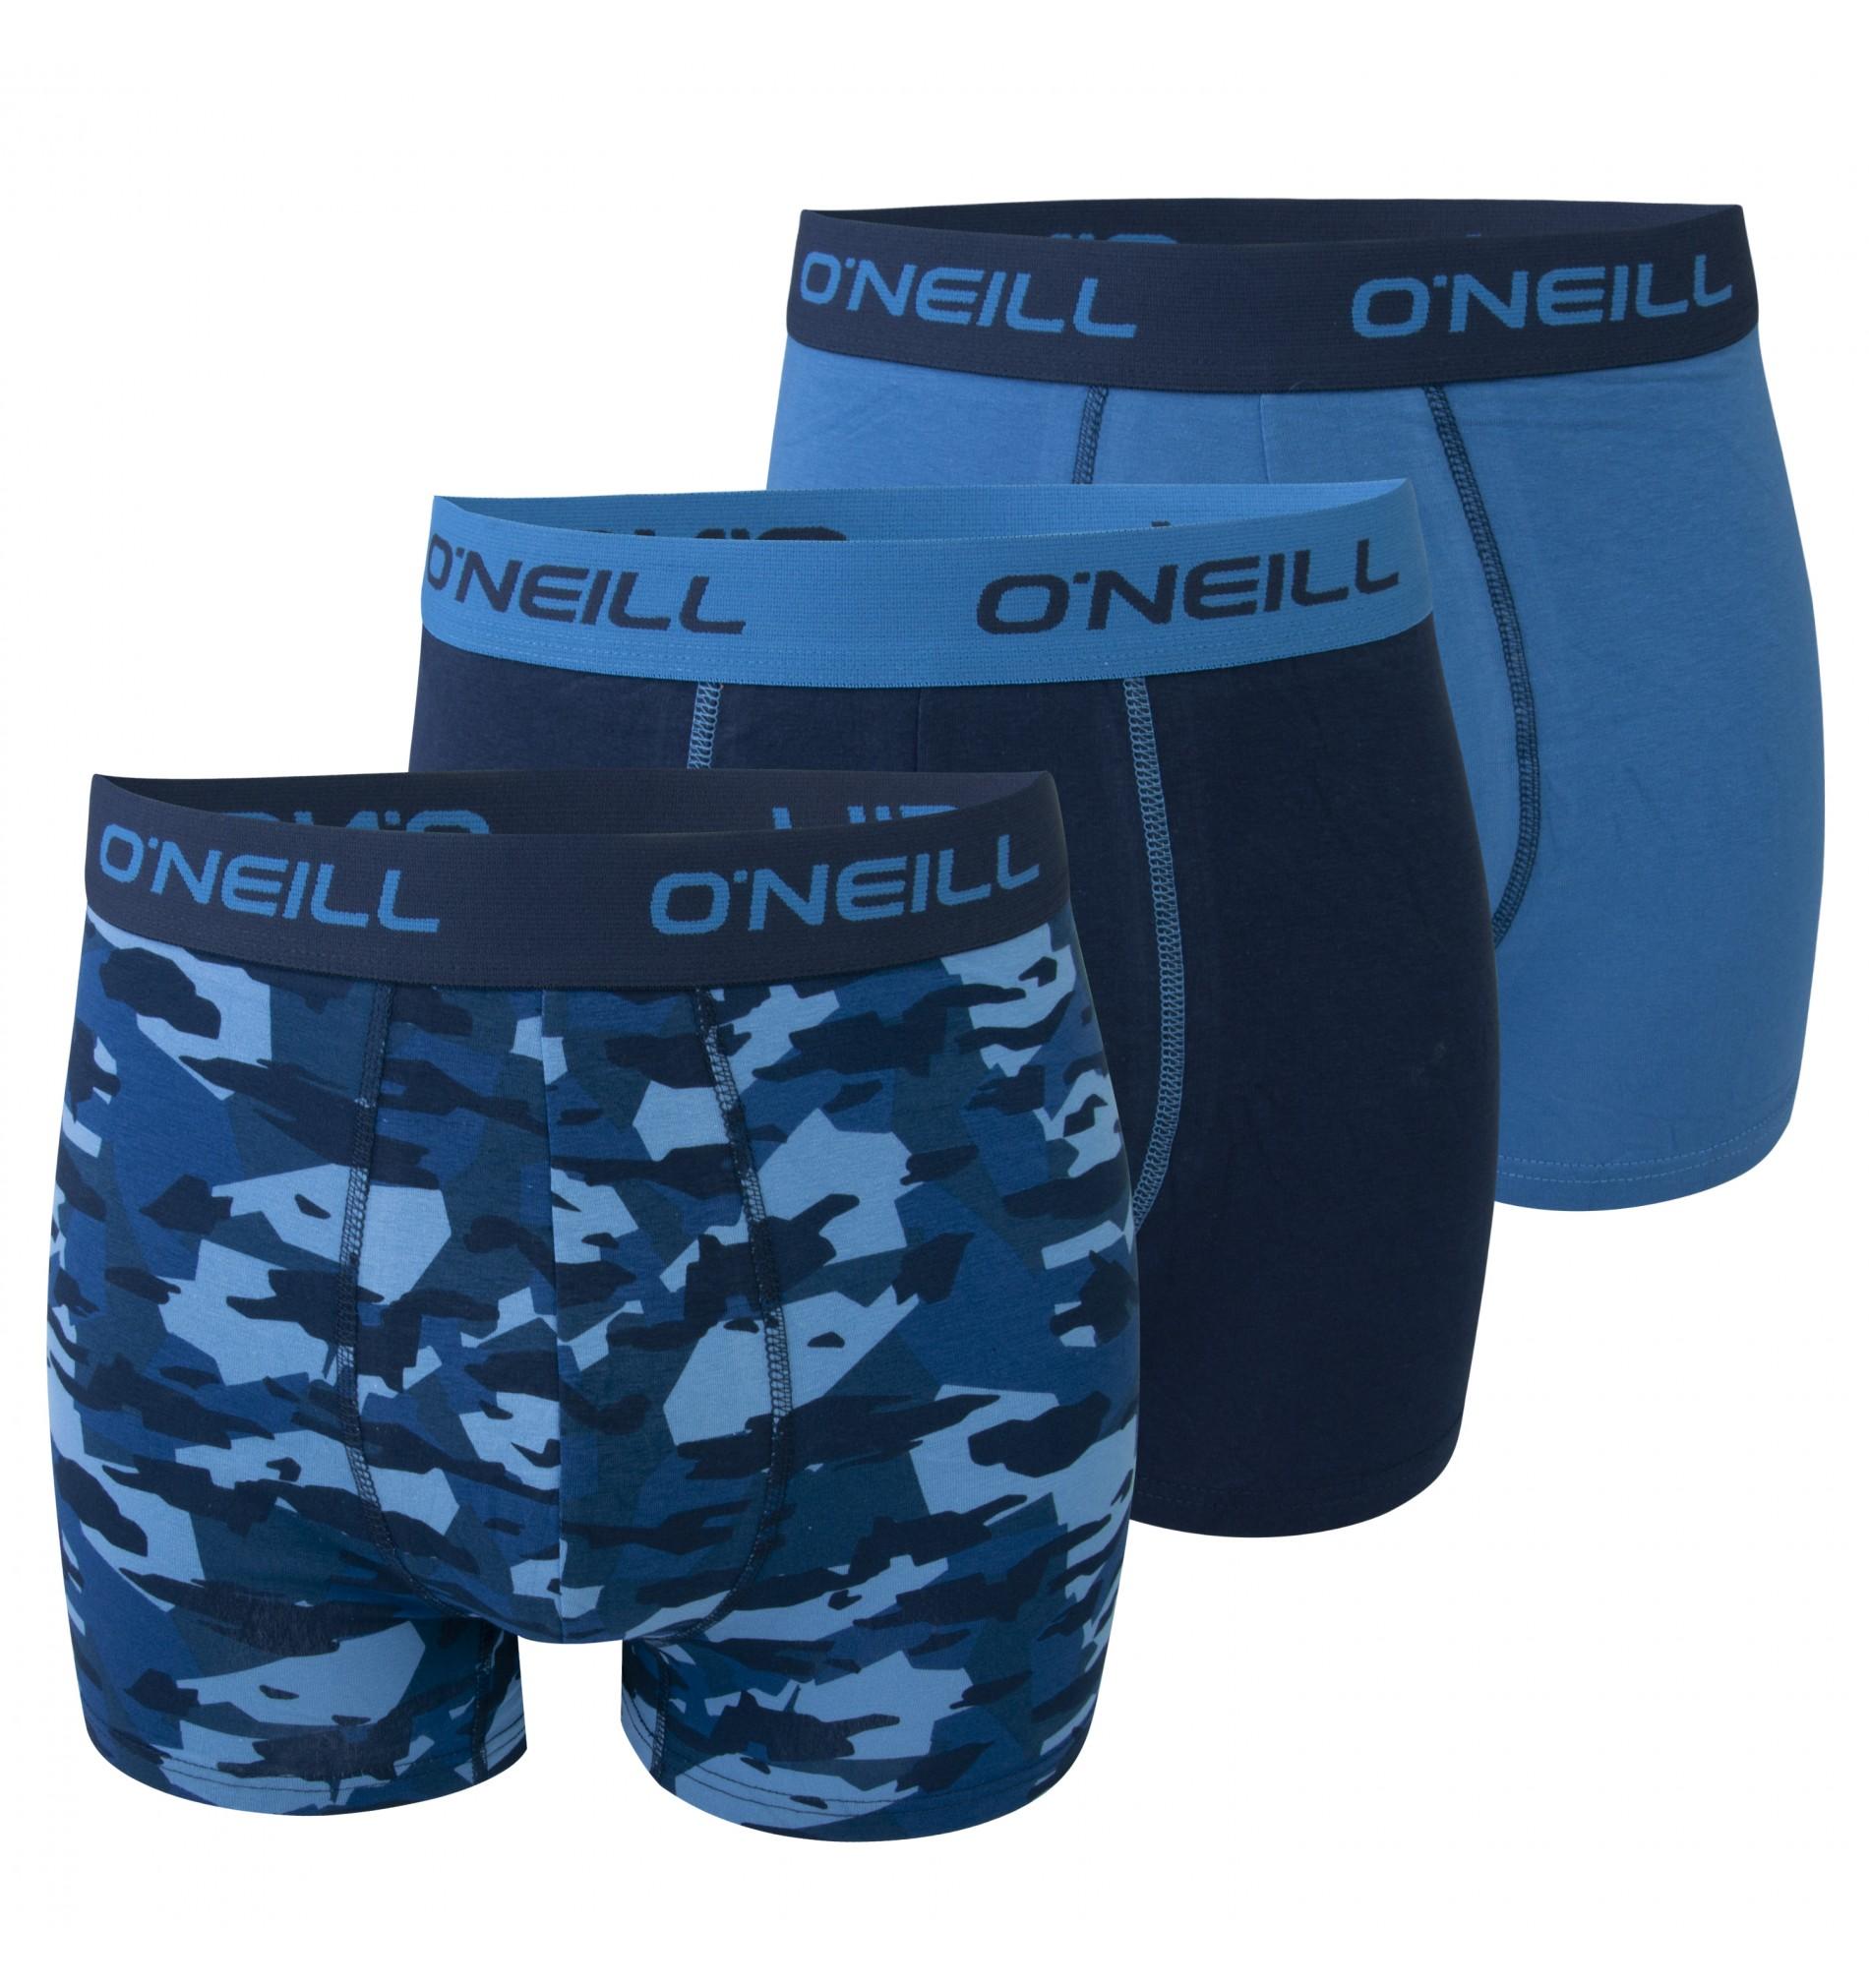 boxerky - 3PACK 'CAMOUFLAGE' svetlomodrá,tmavomodrá,maskáčová modrá  4744